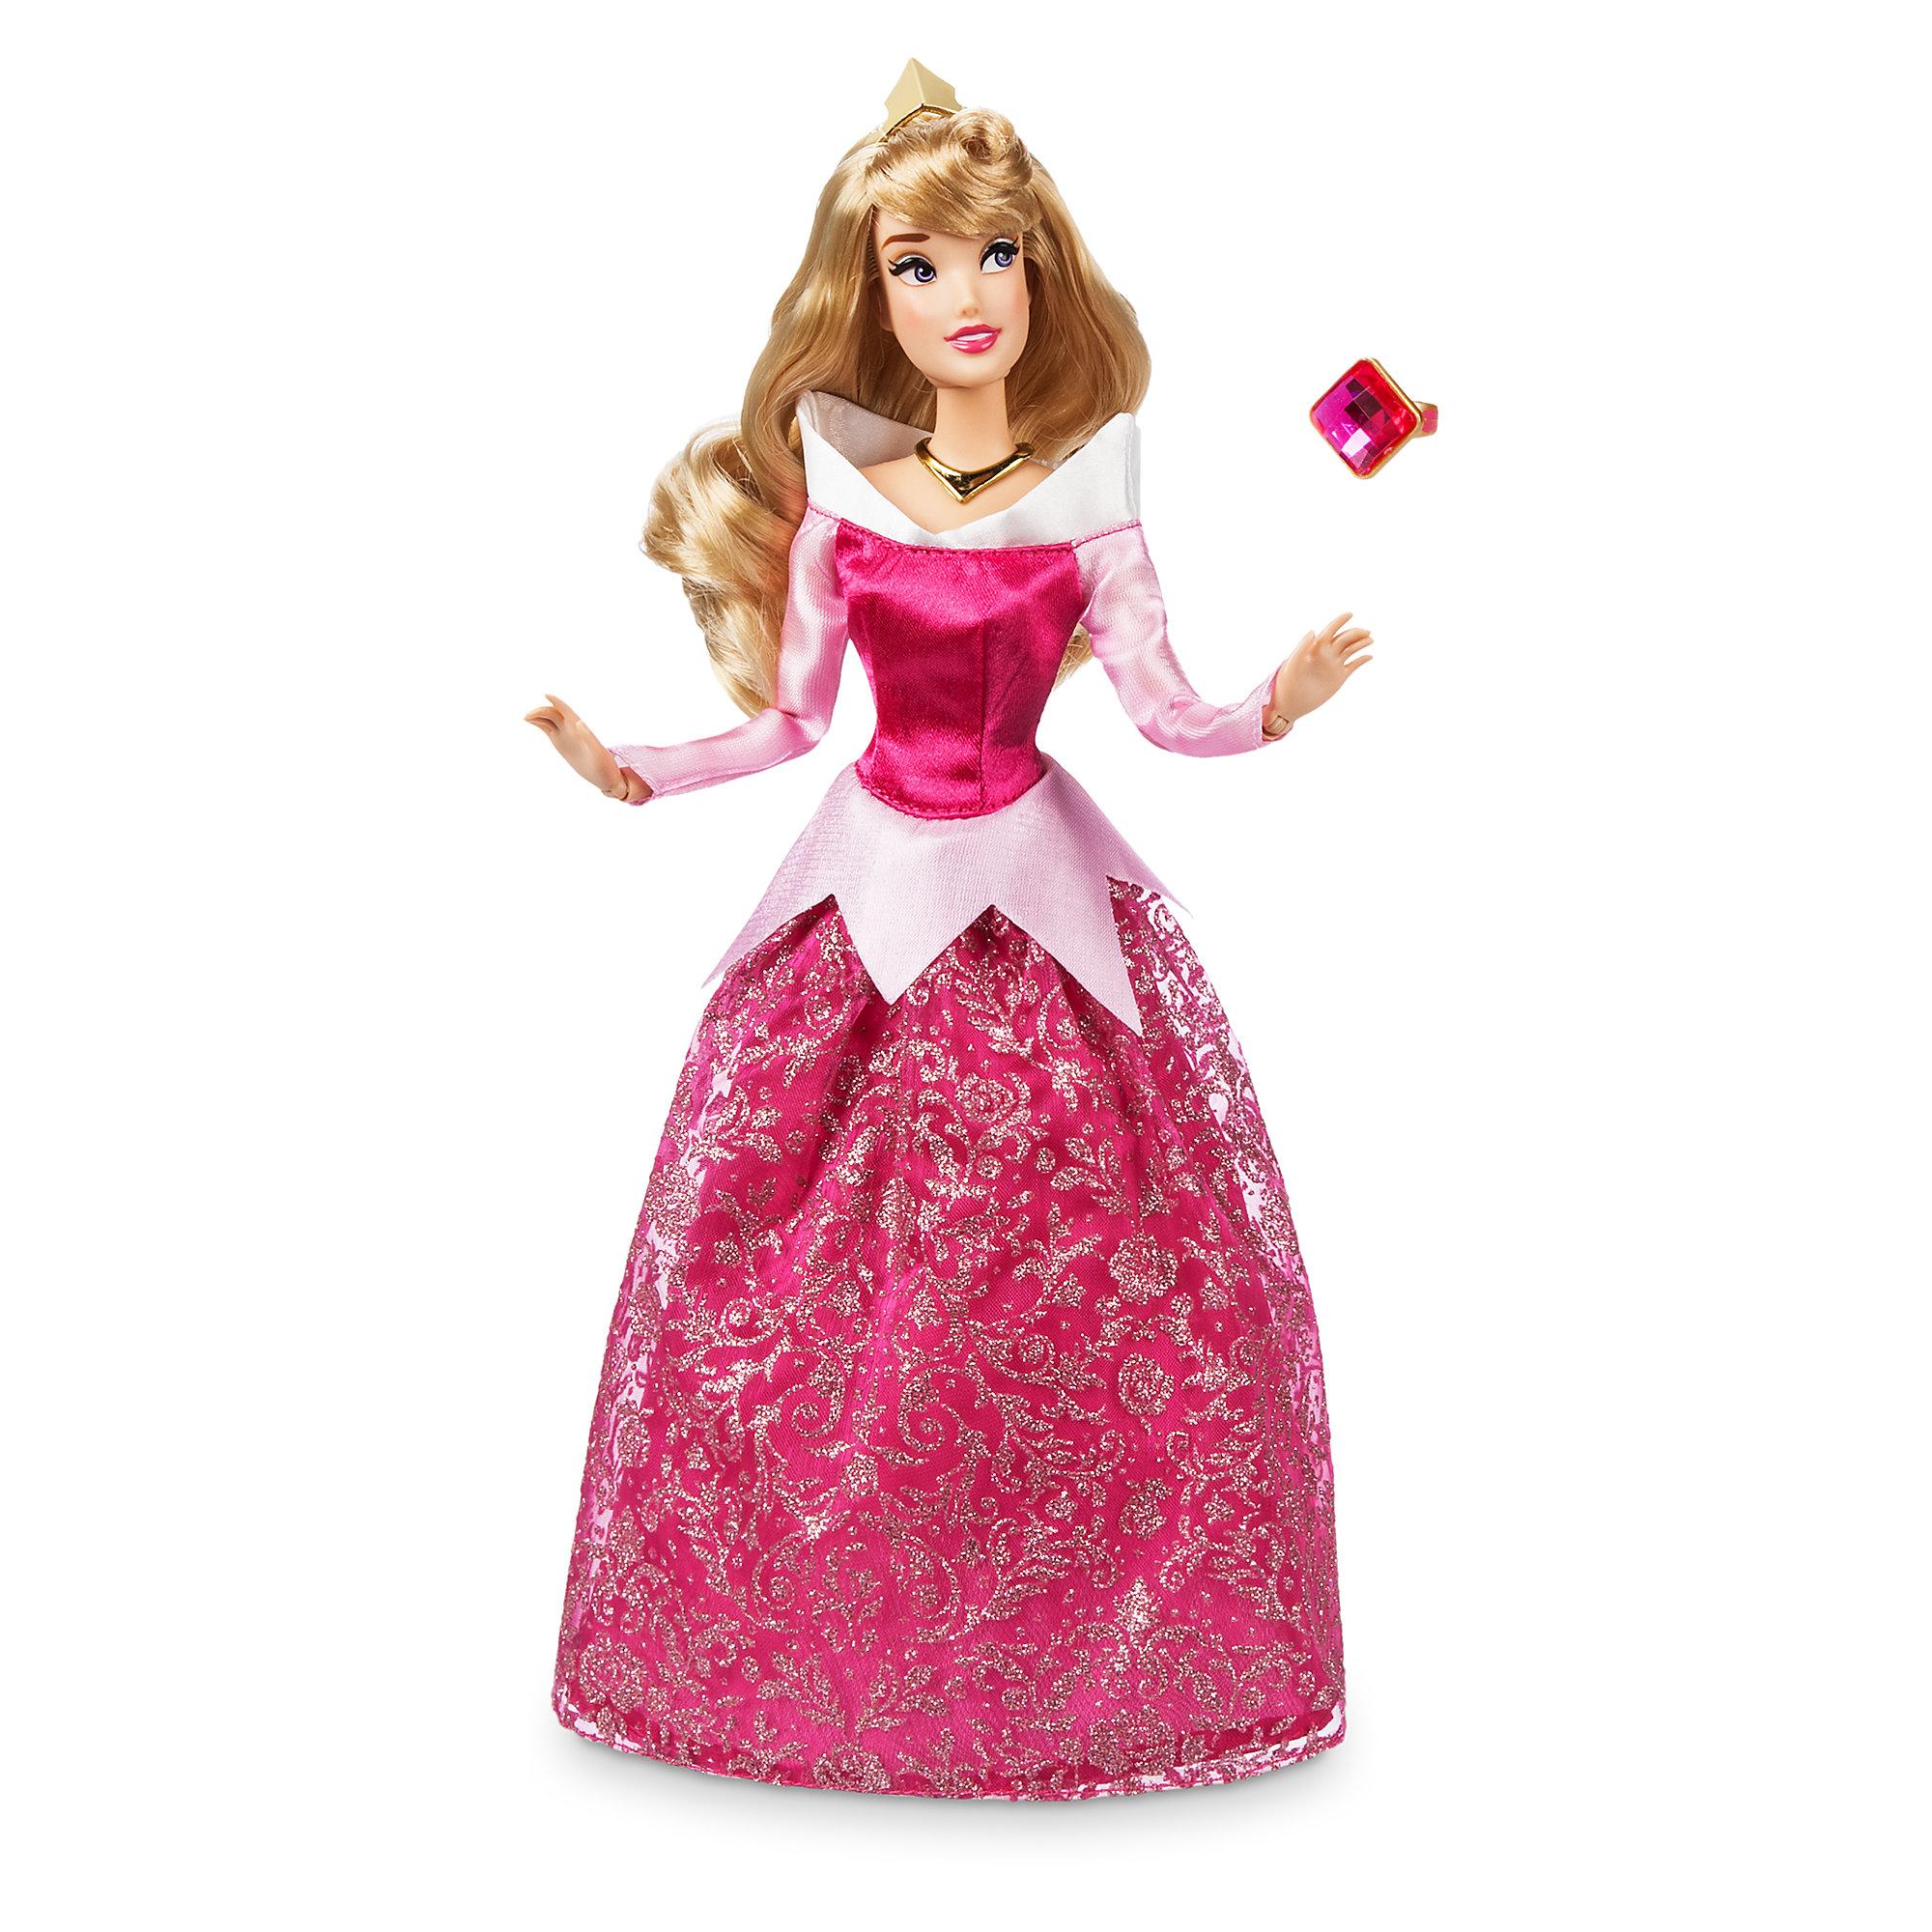 Sleeping Beauty | Disney Movies